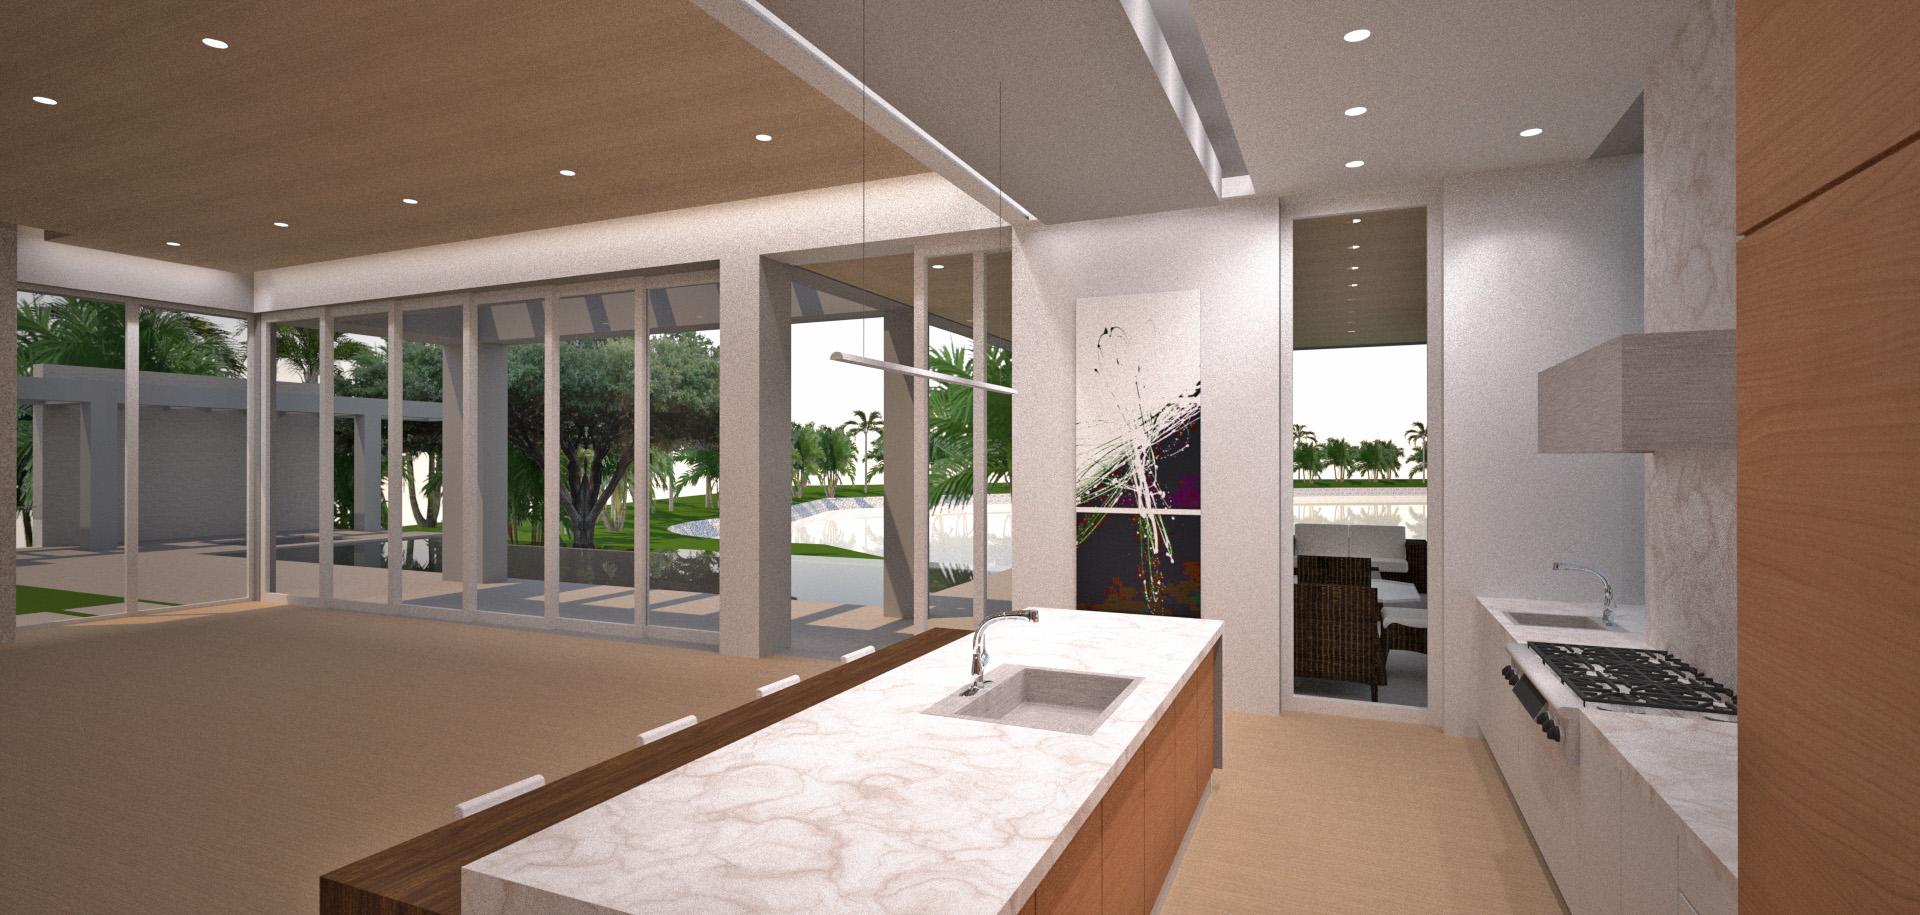 Kitchen 4-model.jpg